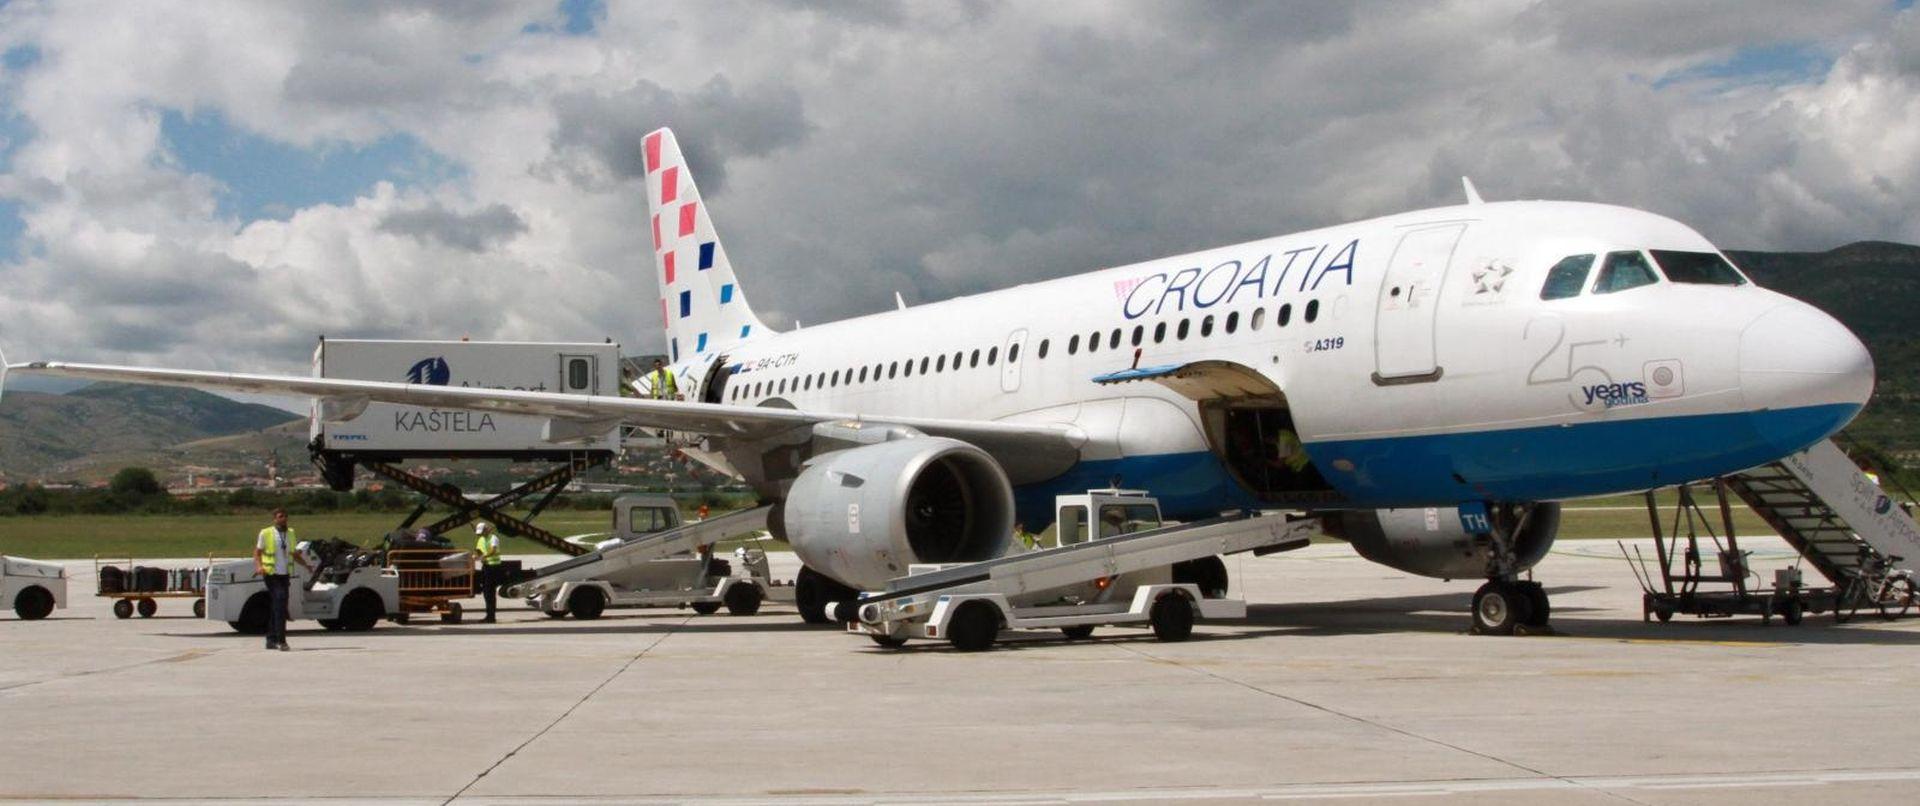 Hrvatskoj iz CEF-a odobreno financiranje četiri nova prometna projekta